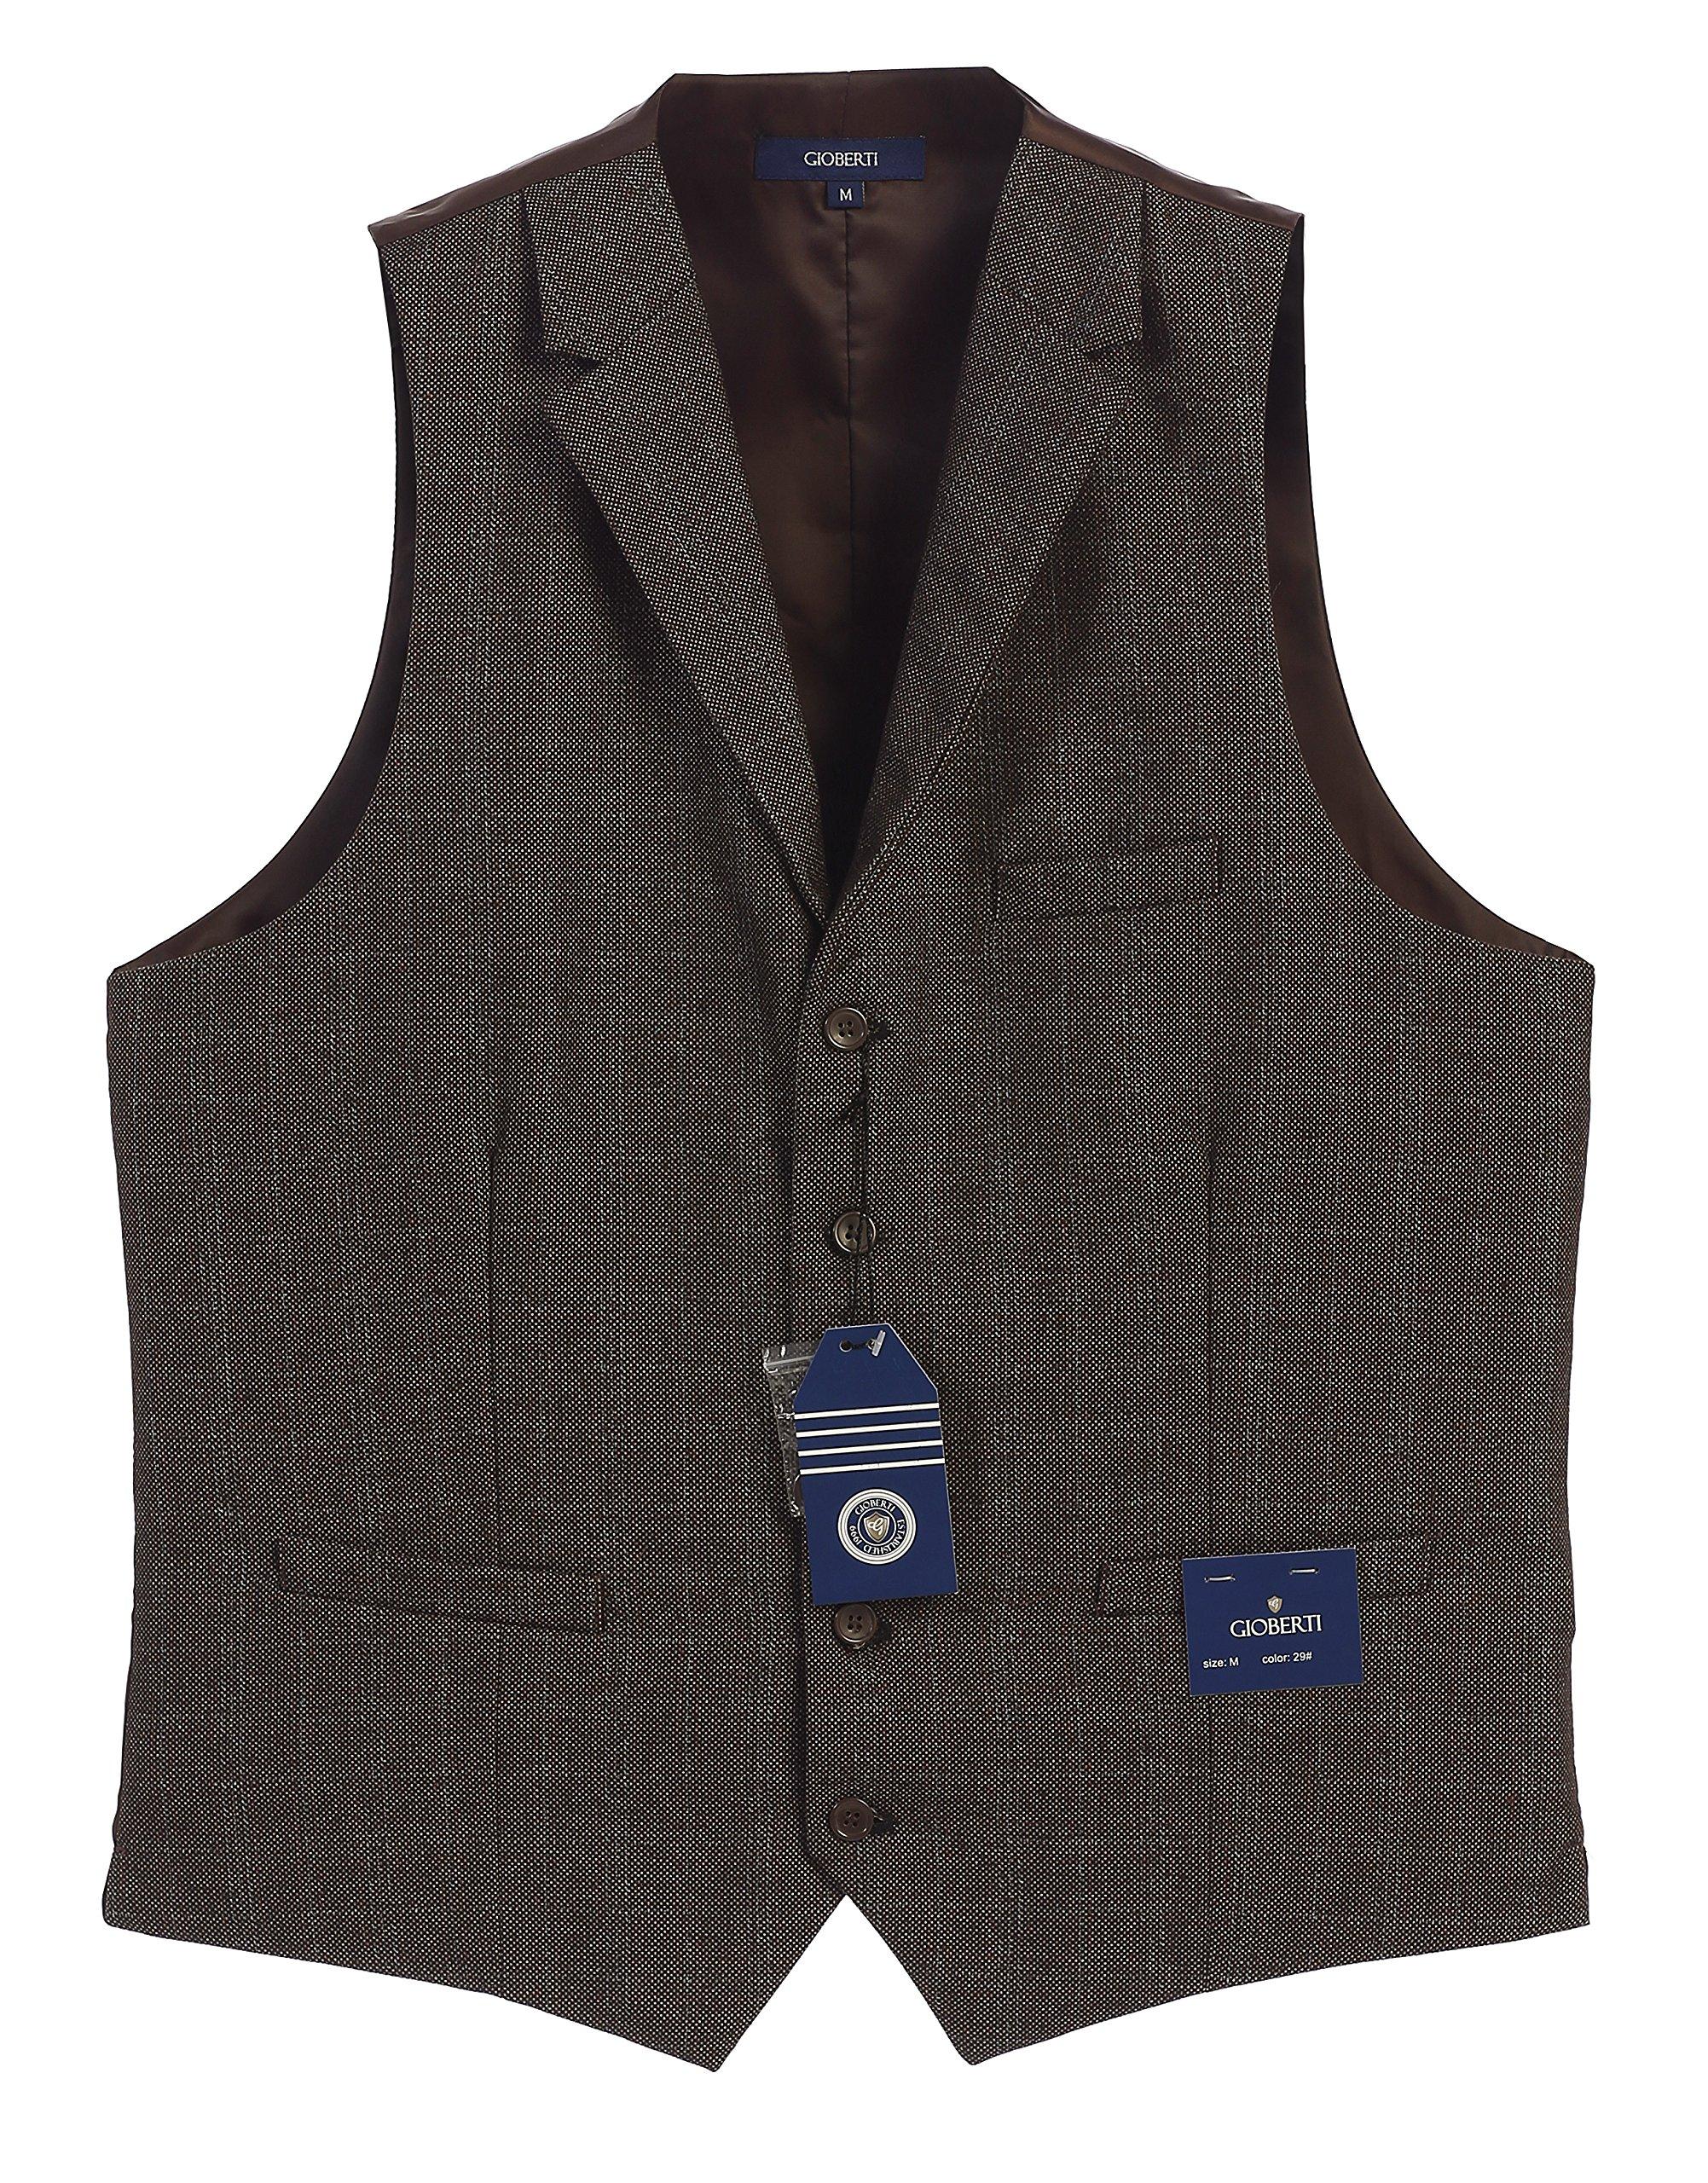 Gioberti Men's 5 Button Tailored Collar Formal Tweed Suit Vest, Brown Barleycorn, 2X Large